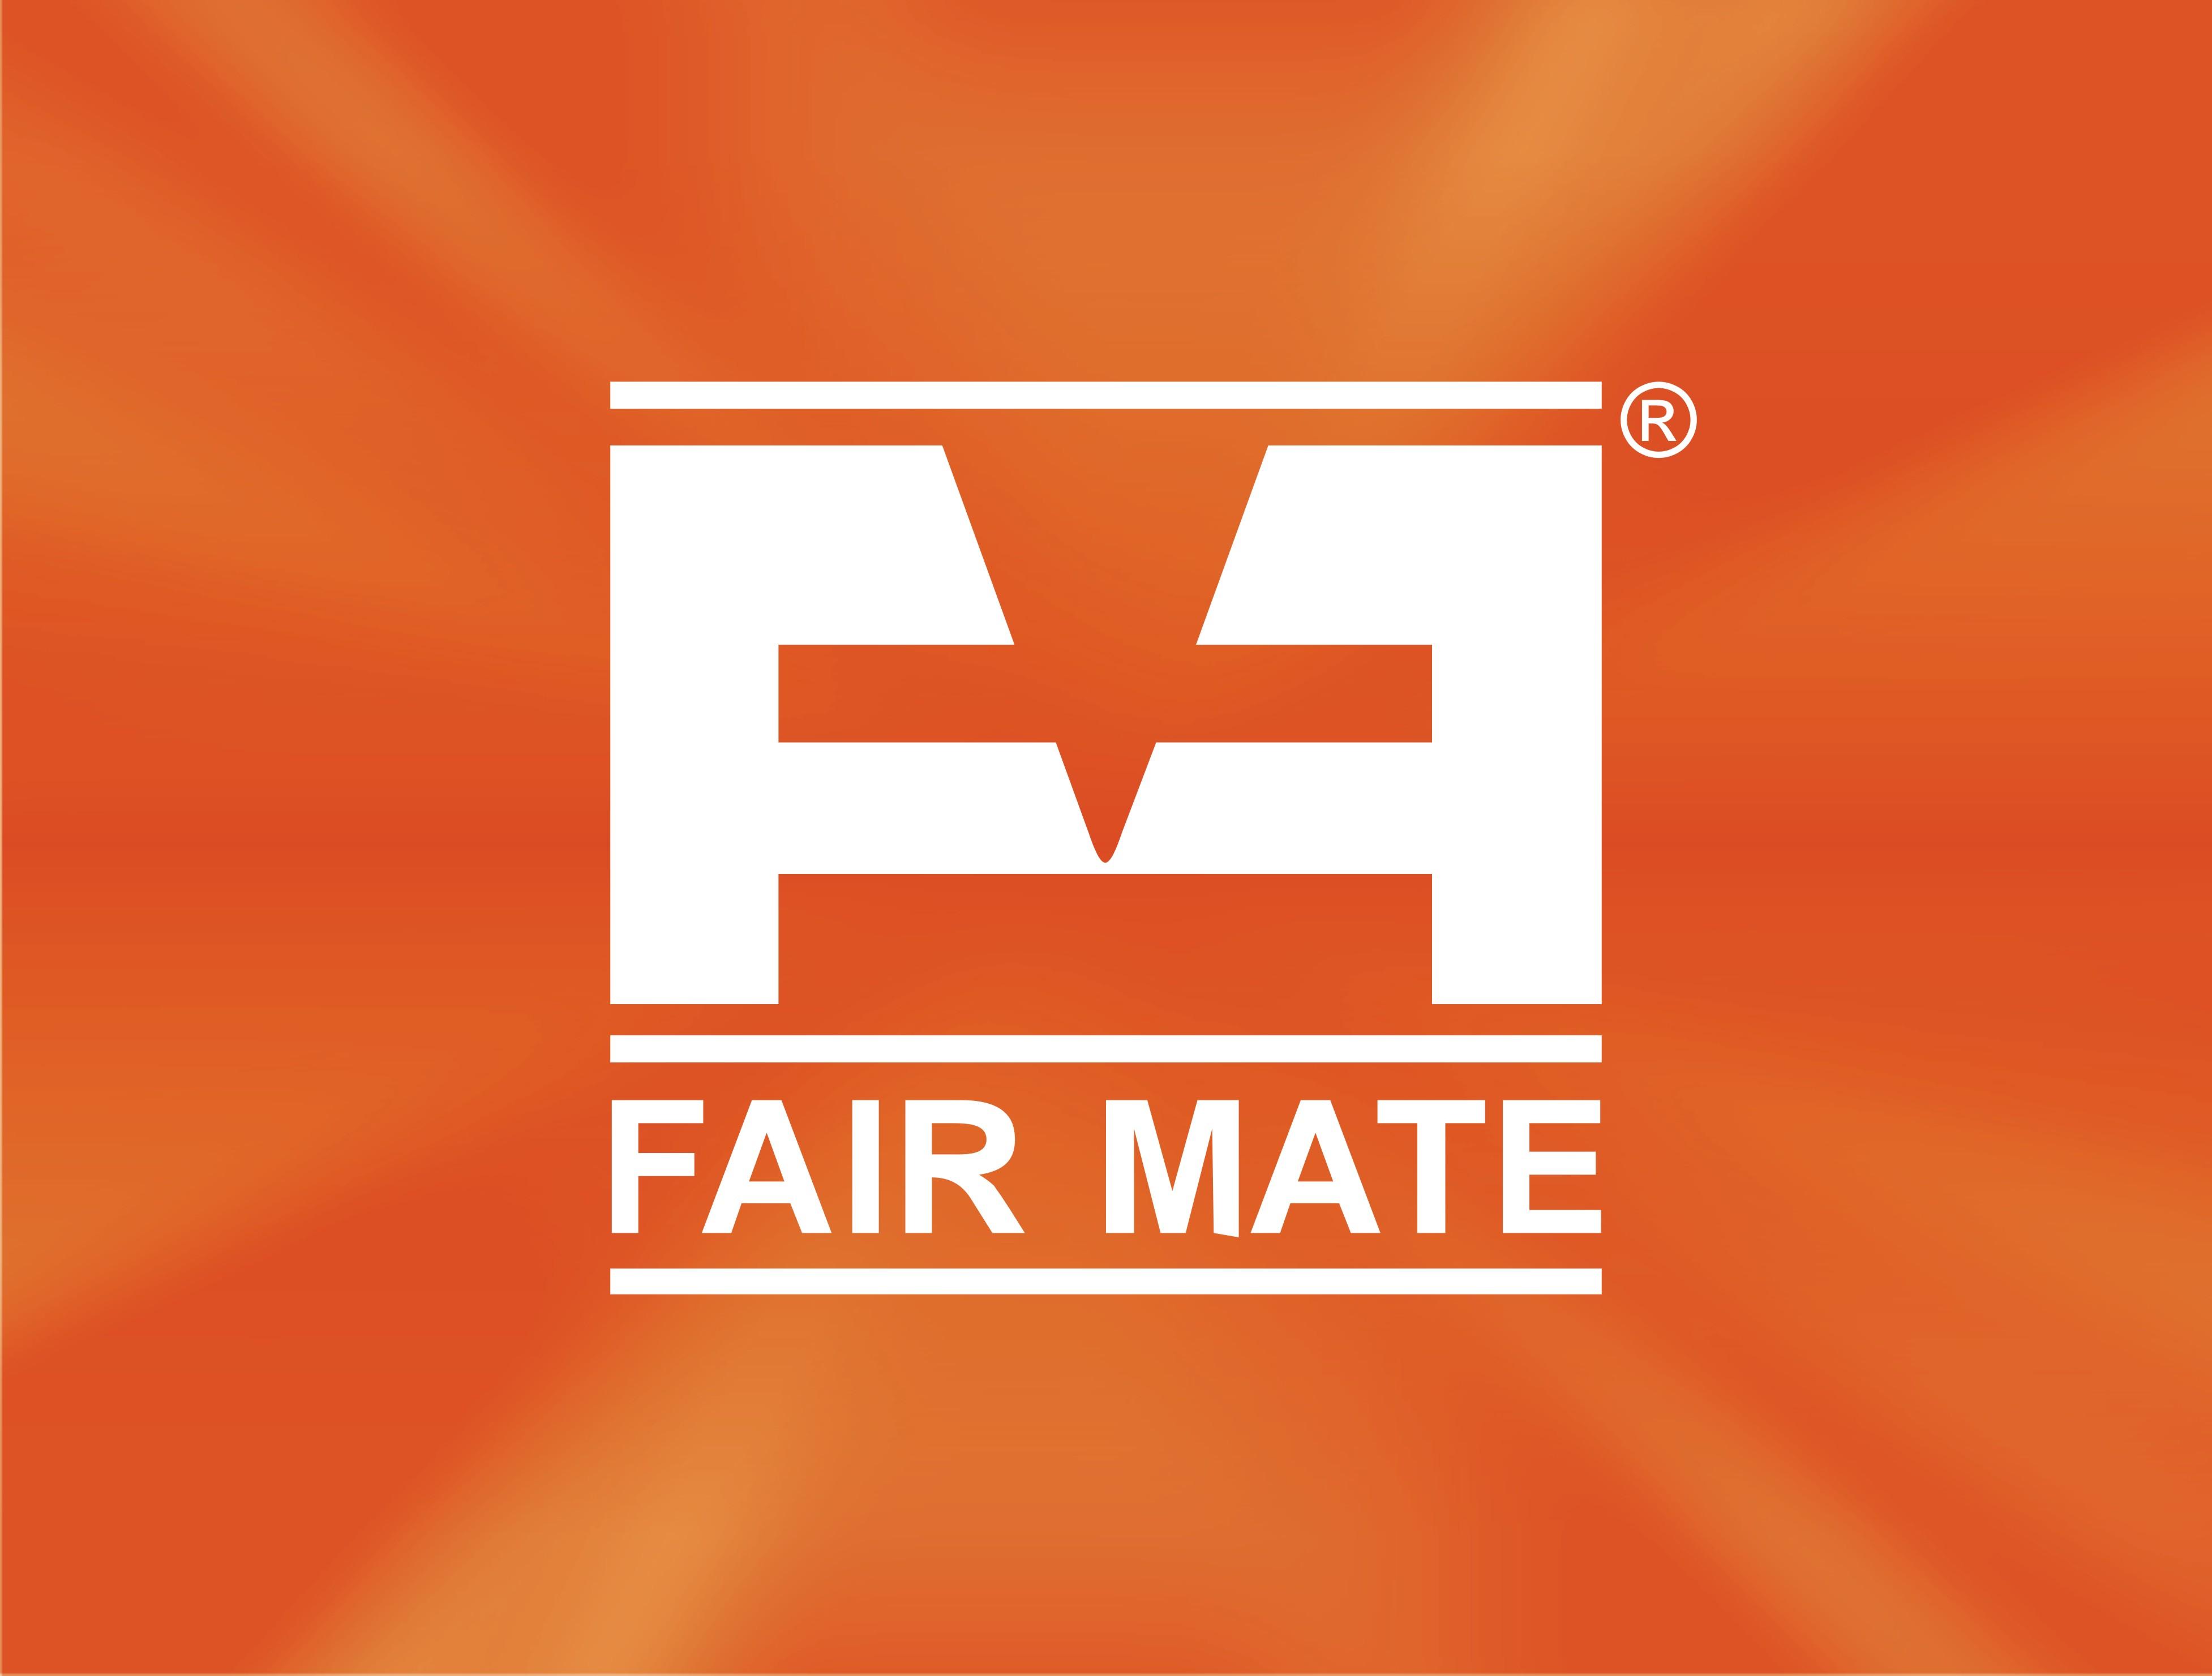 Fairmate Chemicals Pvt Ltd Image